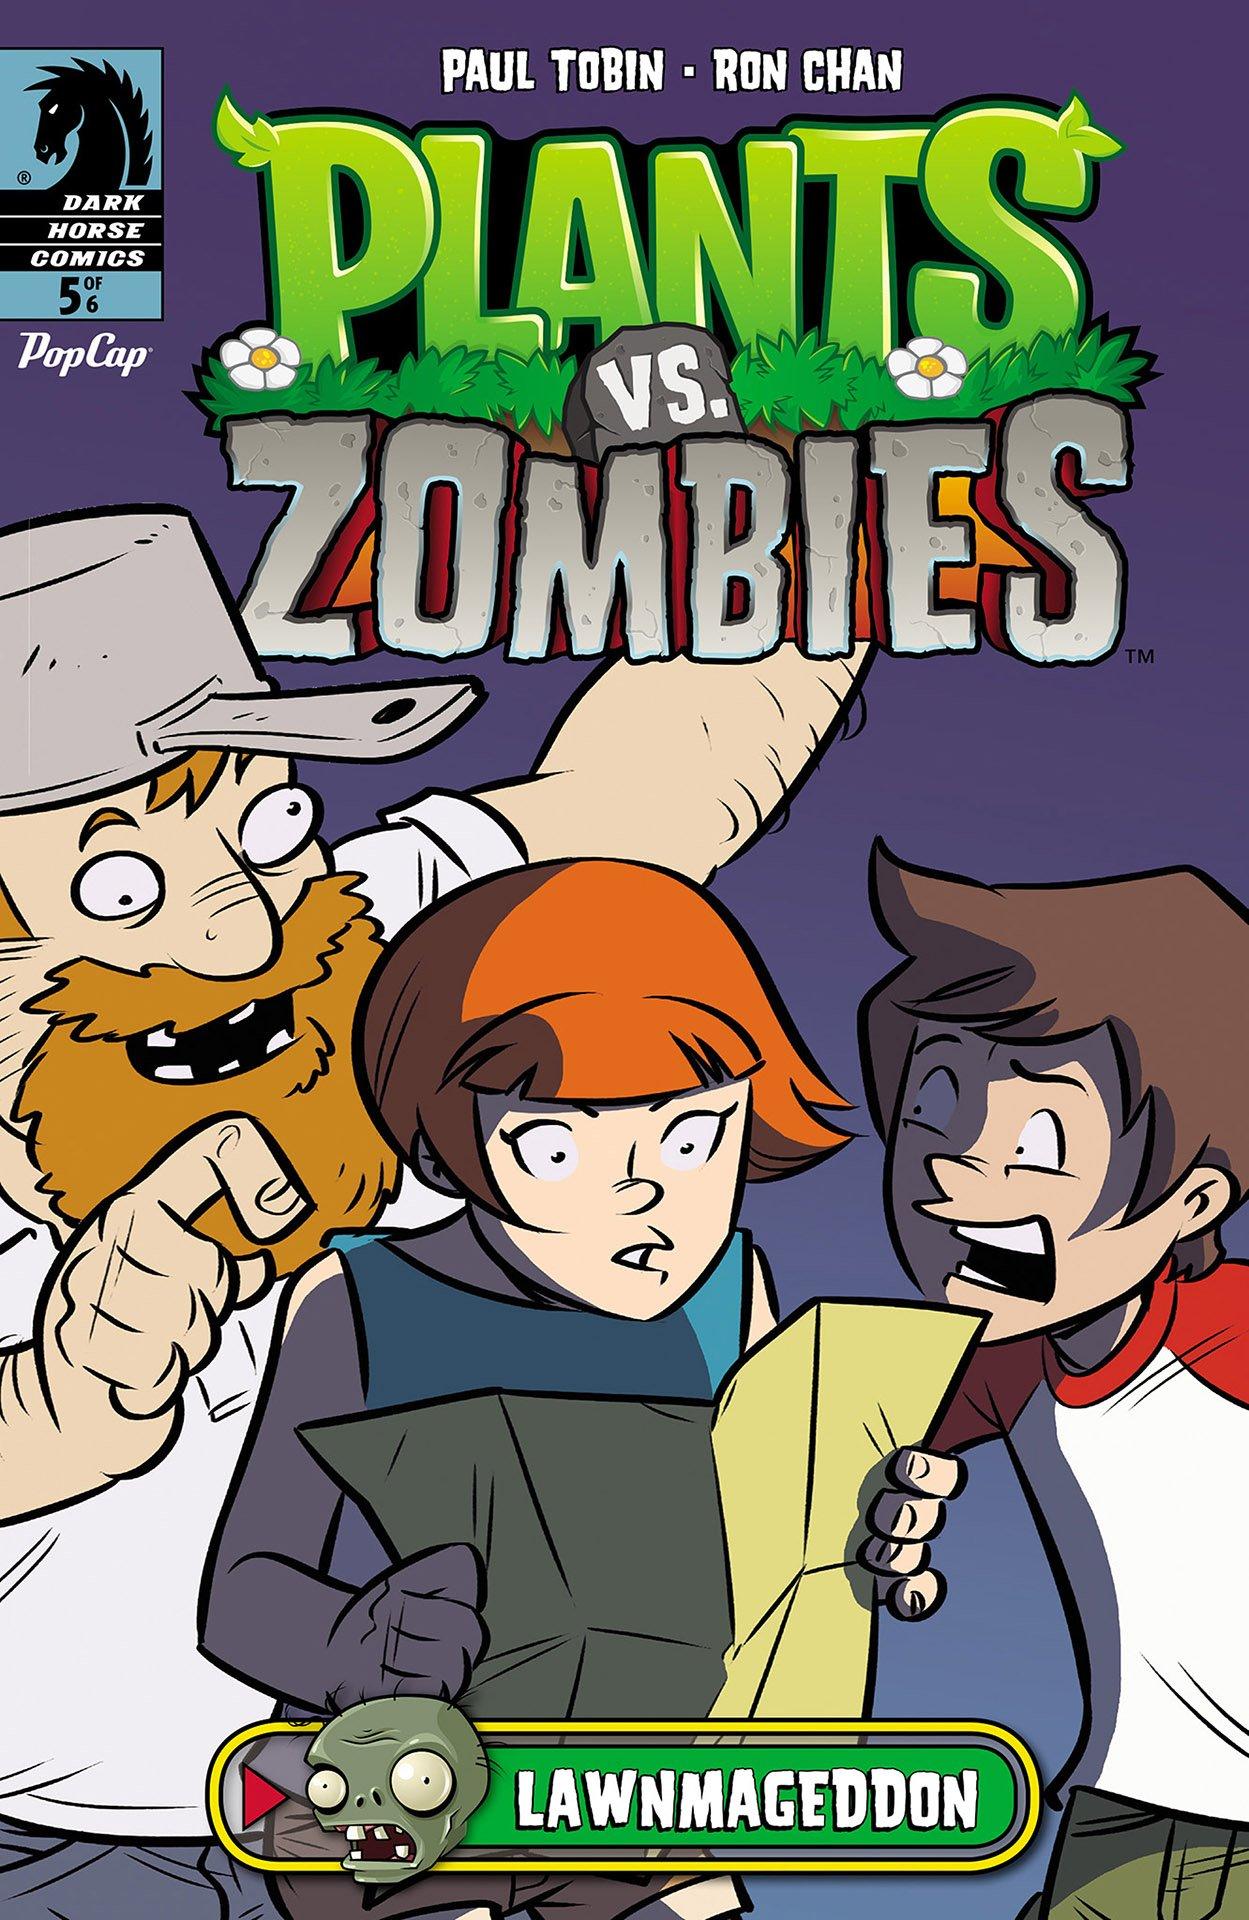 Plants vs. Zombies - Lawnmageddon 005 (August 2013)